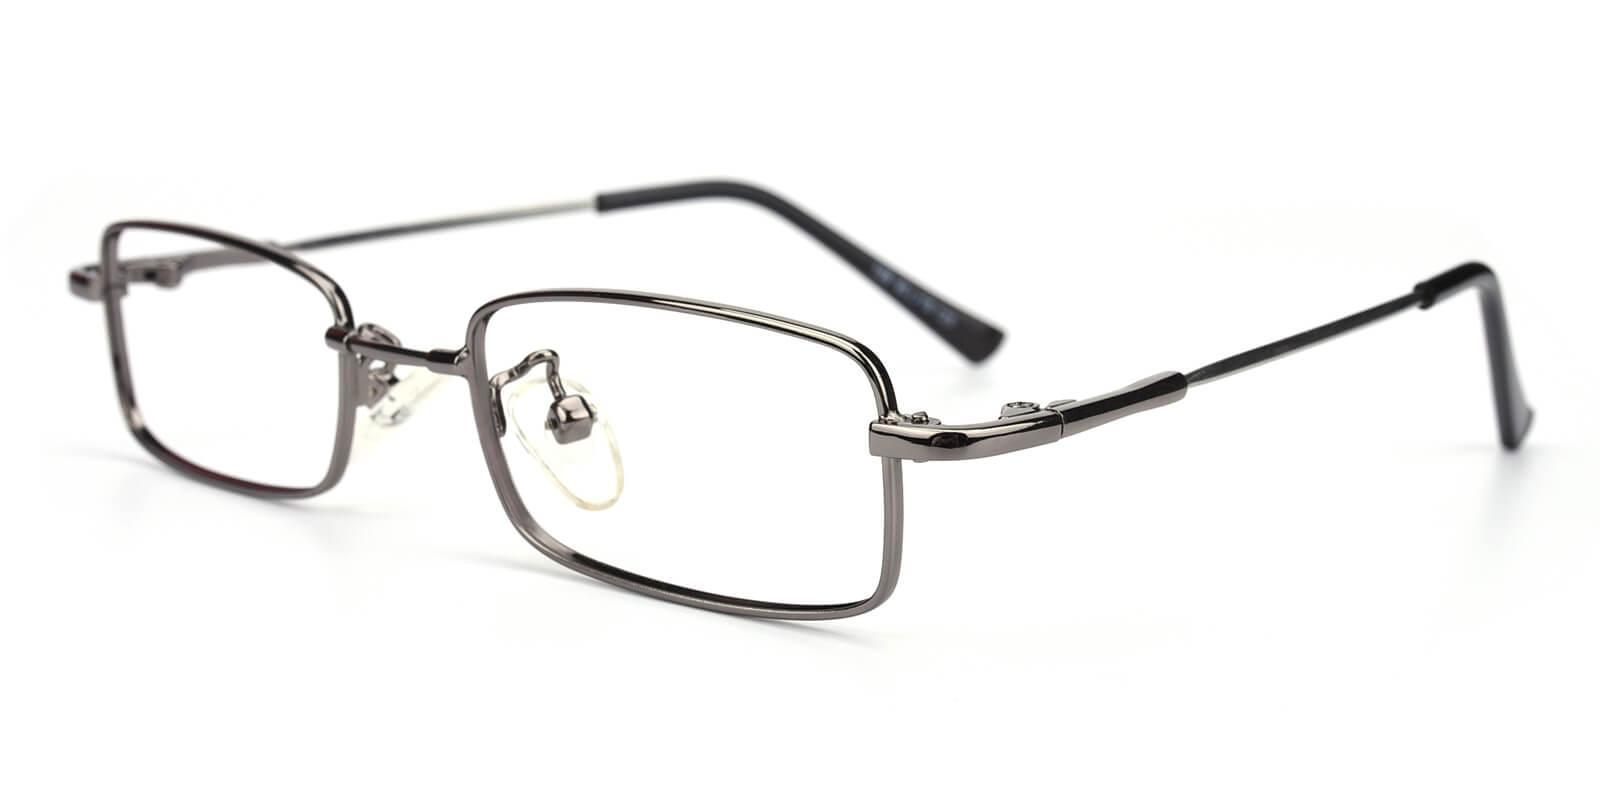 Lanscripe-Gun-Rectangle-Titanium-Eyeglasses-additional1